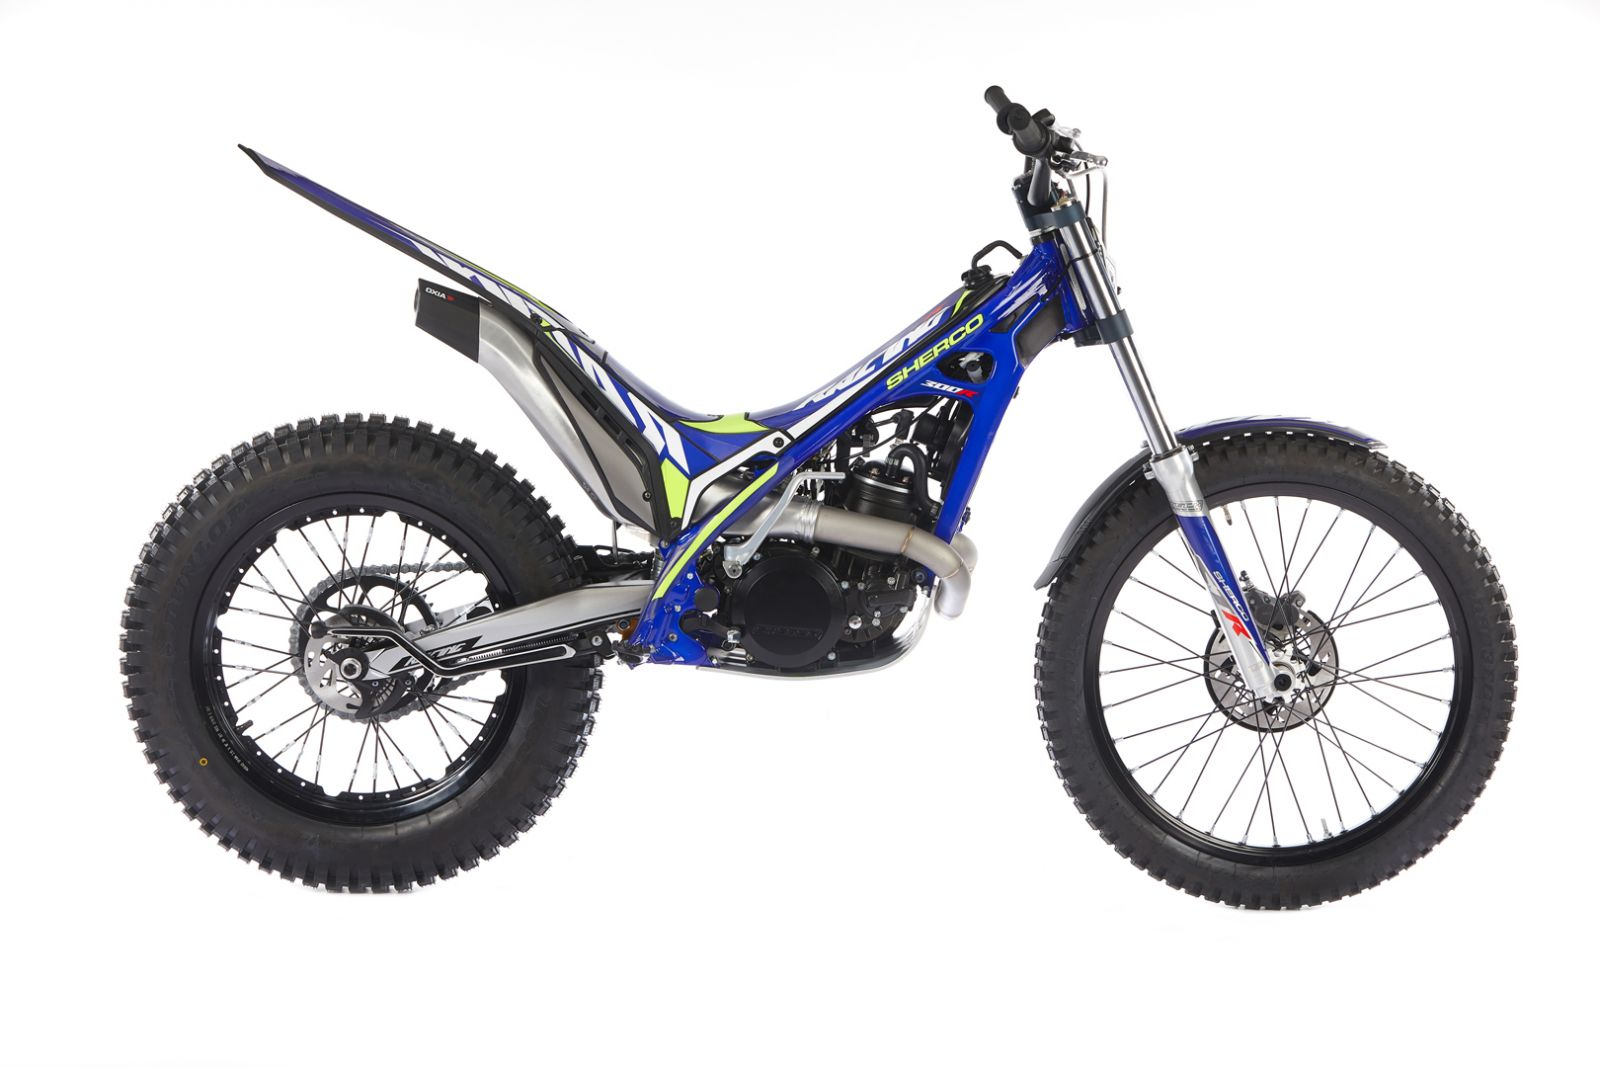 300 ST-R